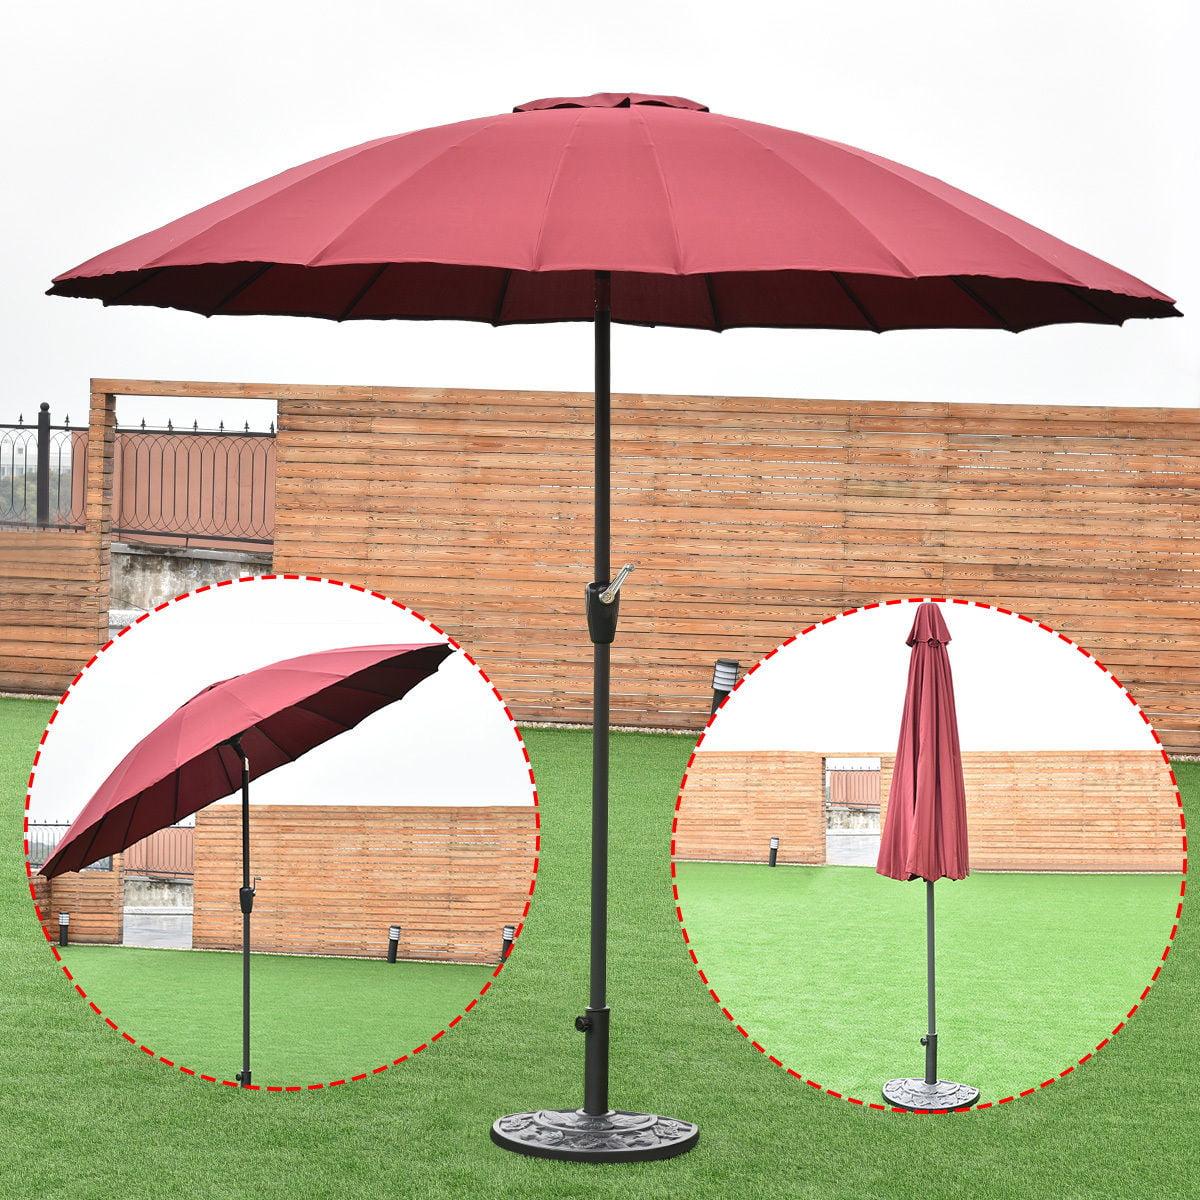 Costway Outdoor 9ft Patio Umbrella Sunshade Cover Market Garden Cafe Crank Tilt Burgundy